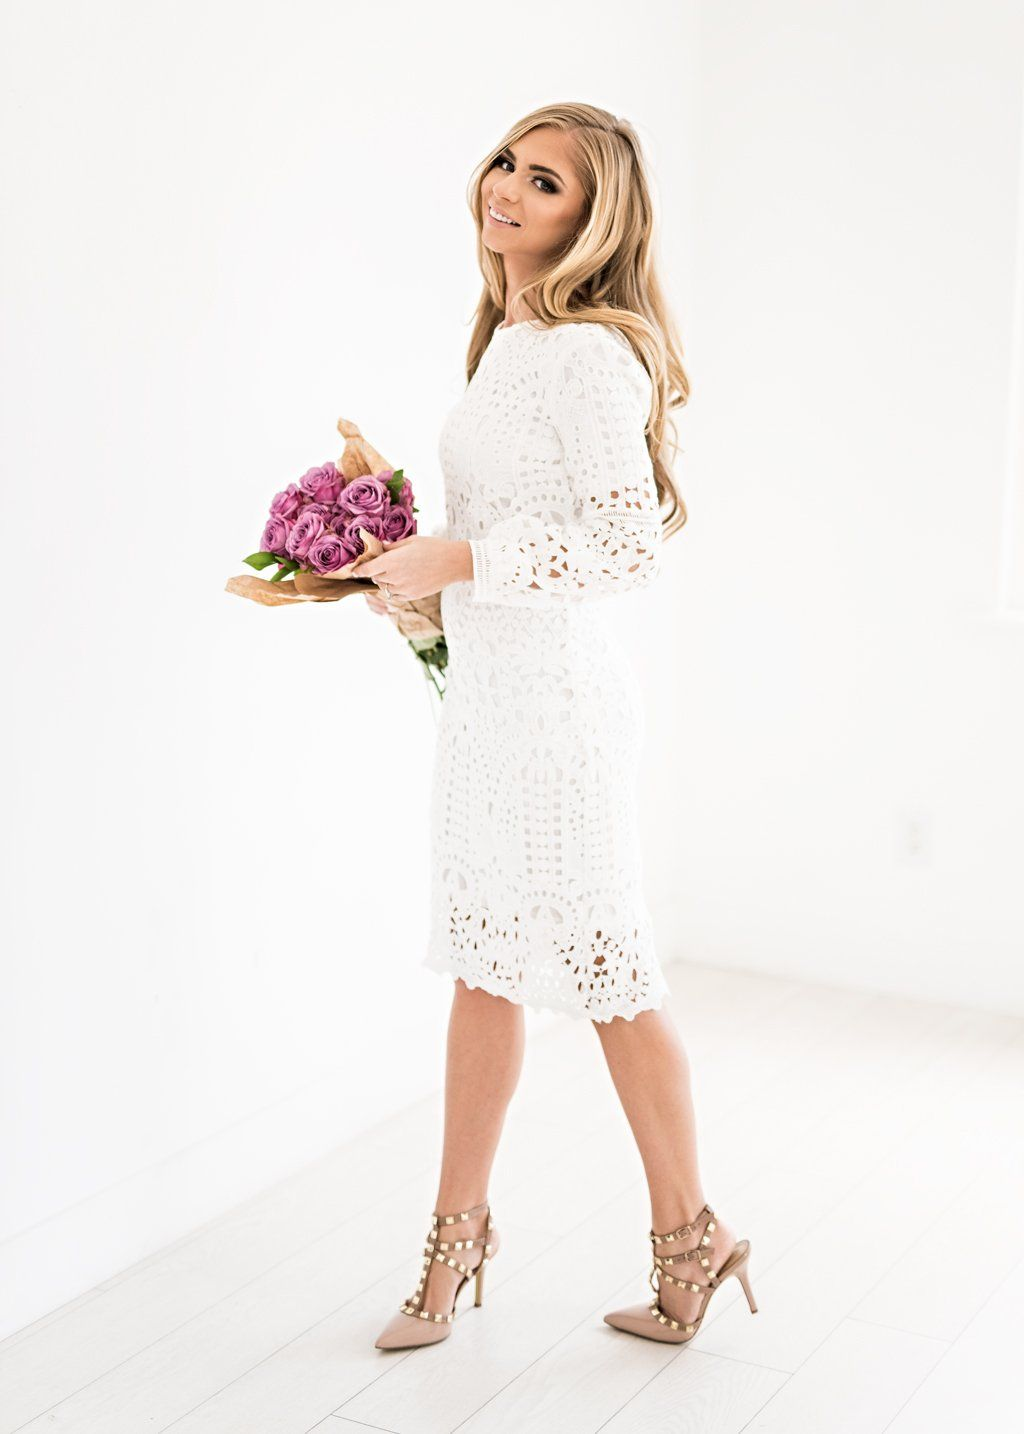 Lace dress for wedding  Julia Lace Shift Dress in White  dresses  Pinterest  Dresses